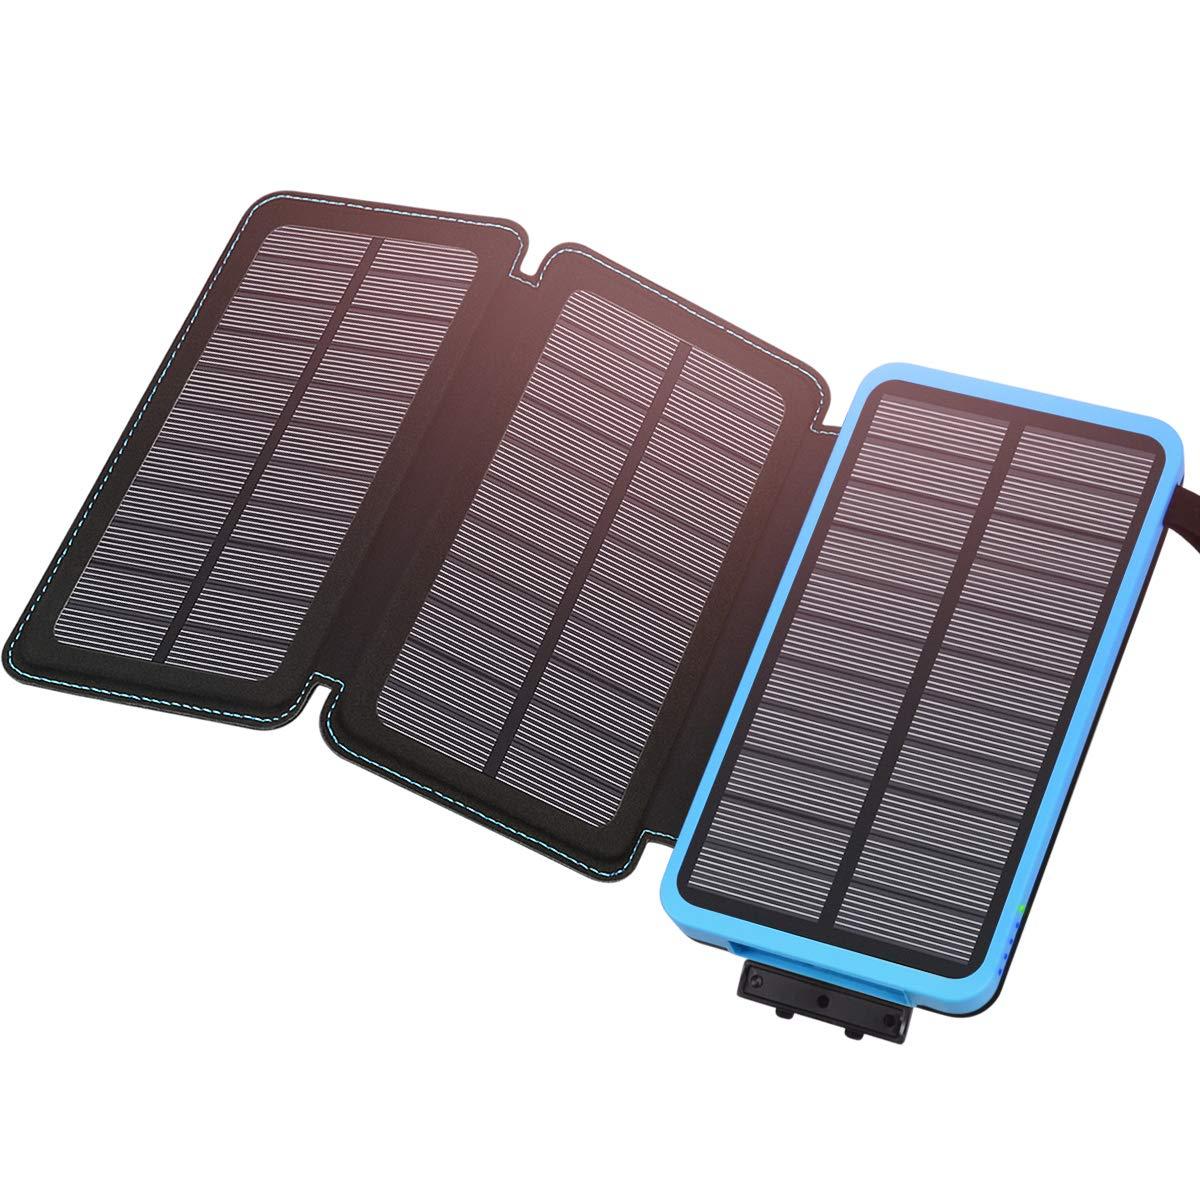 ADDTOP Cargador Solar 24000mAh, Batería Externa Salida 5V / 2.1A